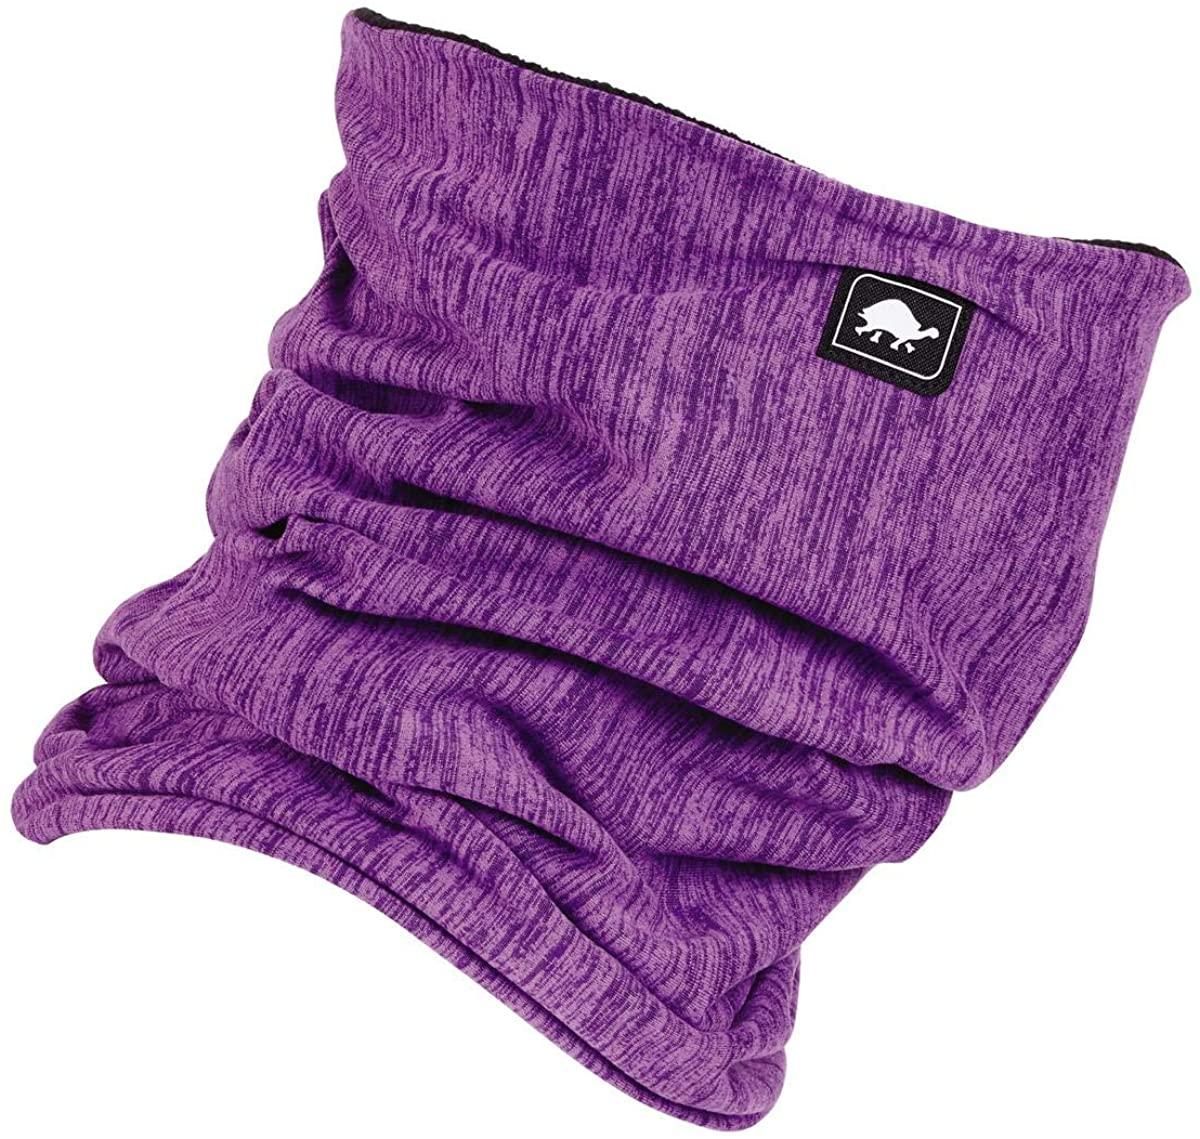 Turtle Fur Comfort Shell UV Pipe Dream Fleece Lined Neck Warmer, Stria Prints